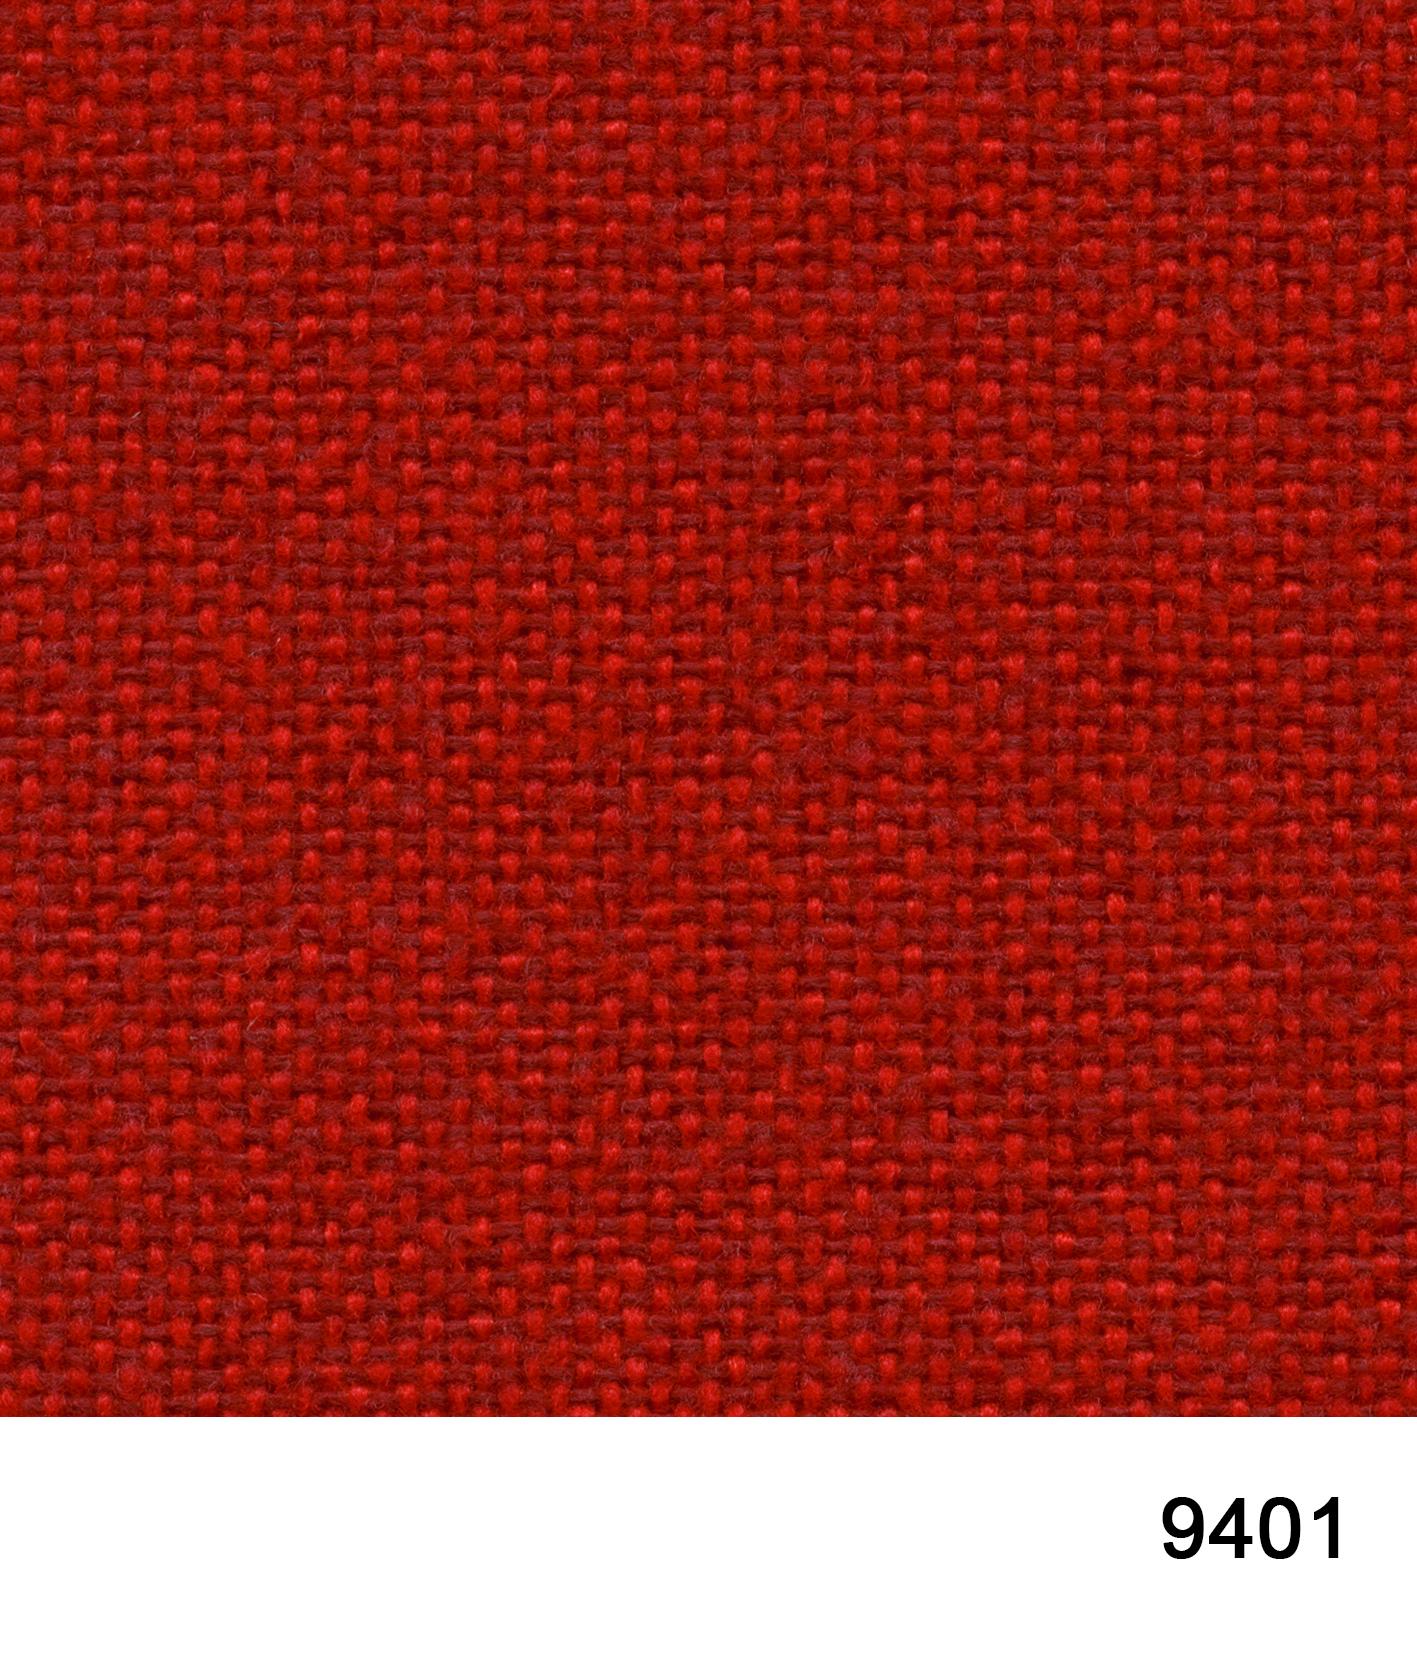 JET BIOACTIVE 3161